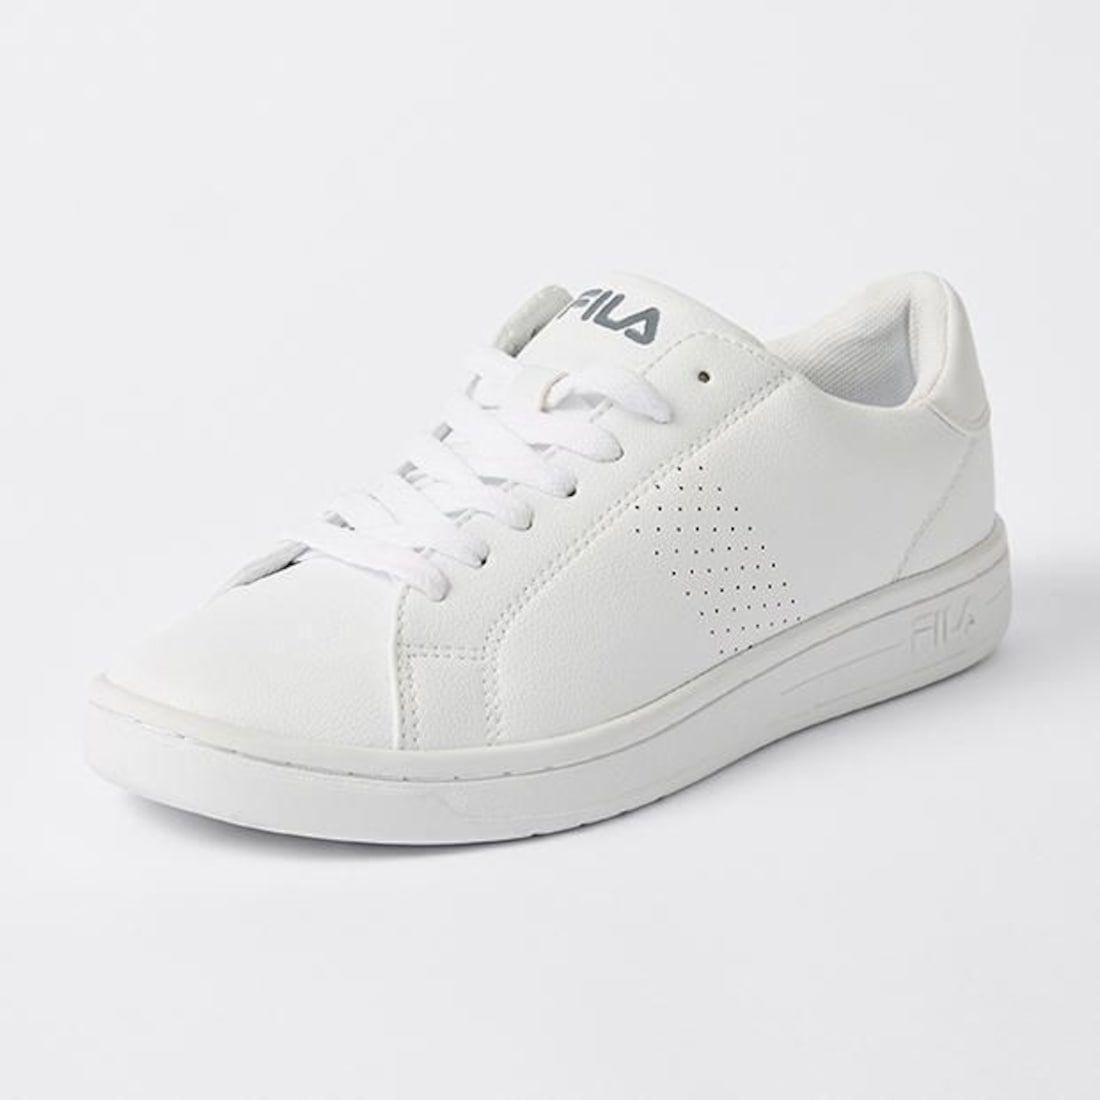 Fila Tennis Shoes   Target Australia in